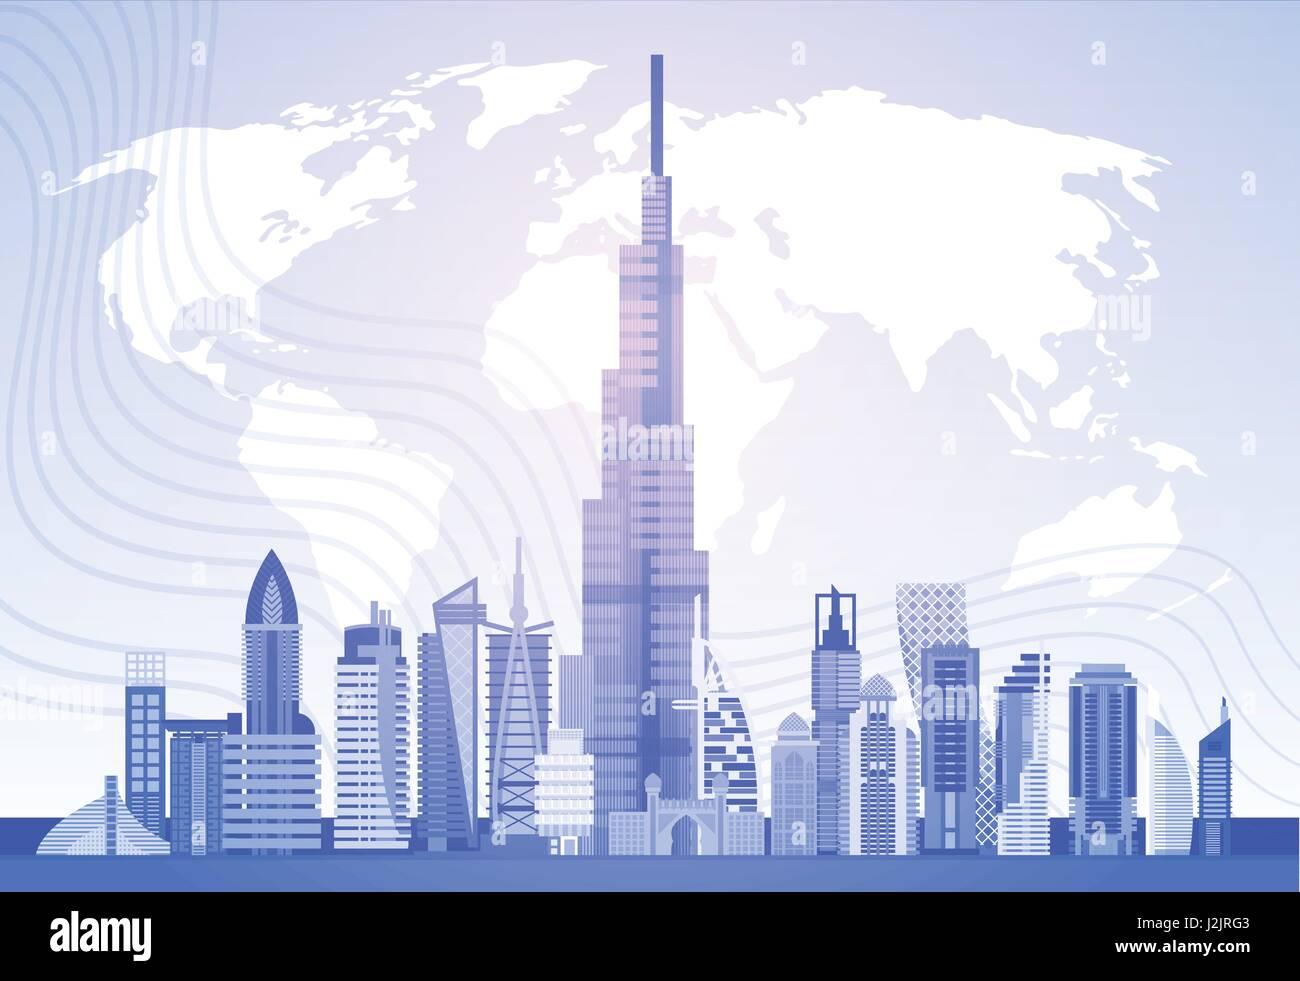 Dubai Skyline Panorama Over World Map, Modern Building Cityscape ...